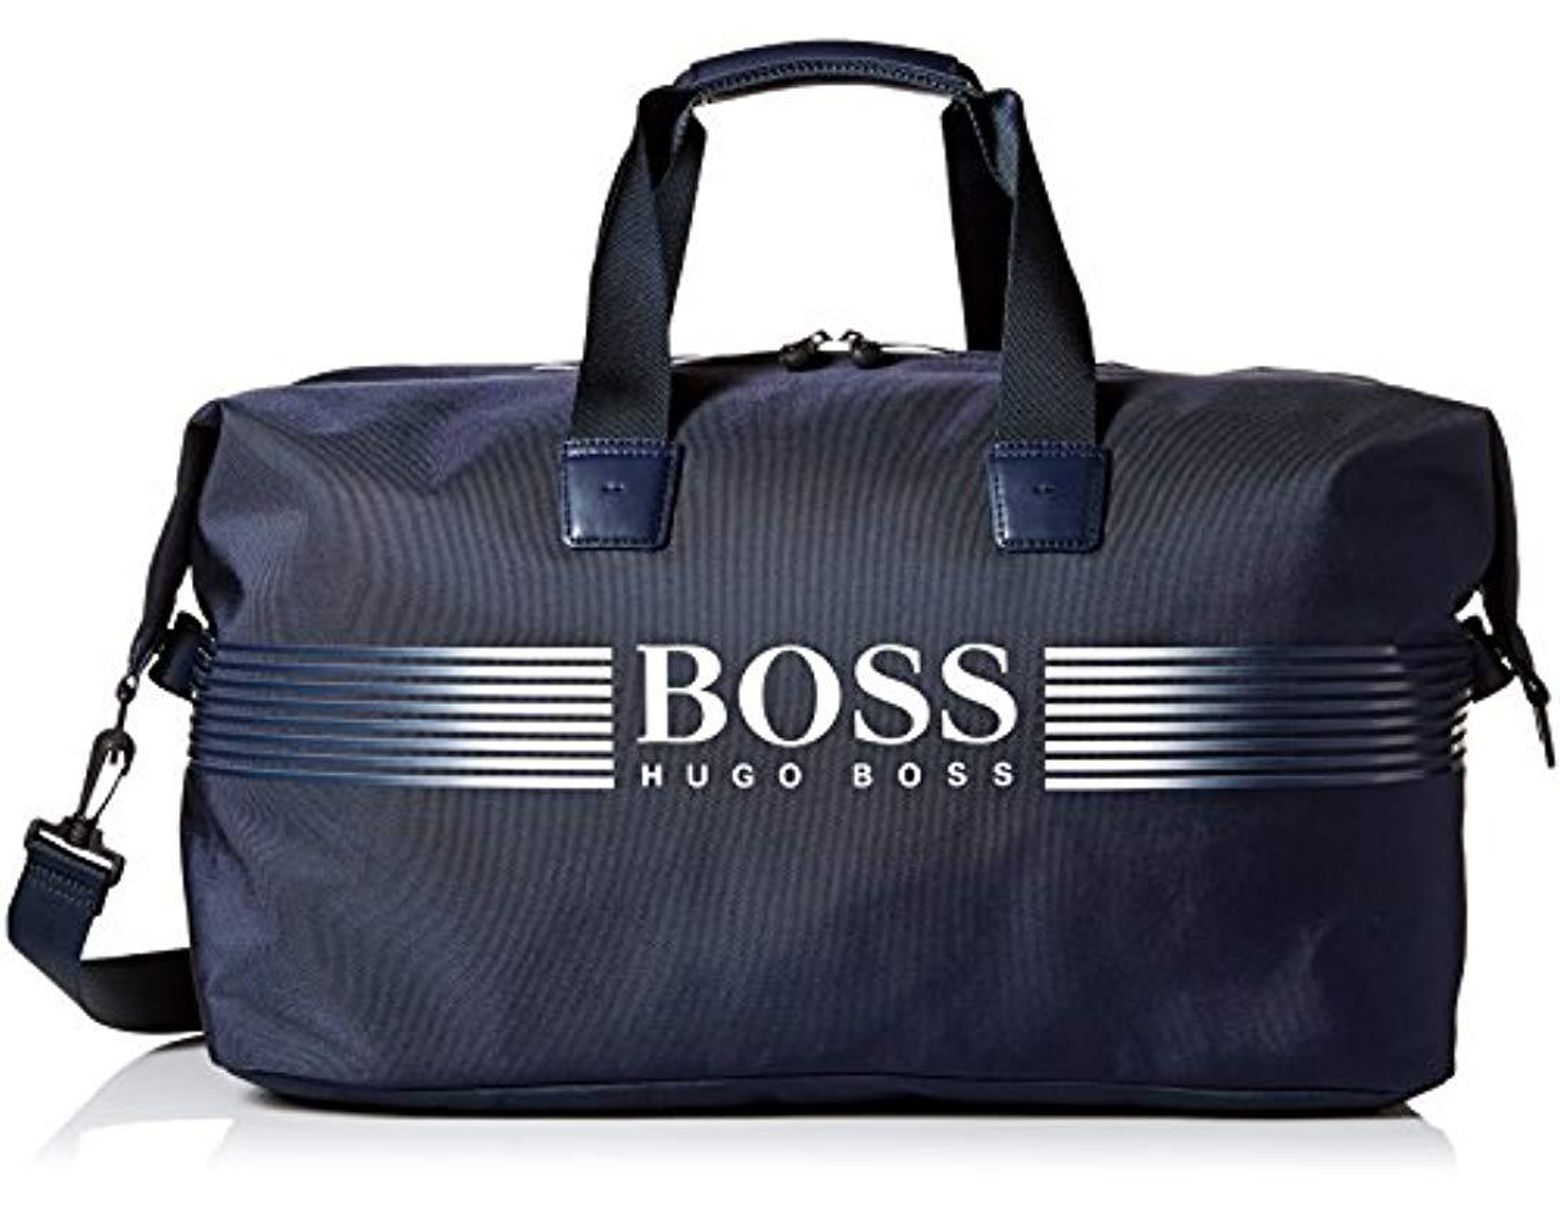 d514d8a5ba3 BOSS Boss Green Pixel Nylon Holdall Weekender Bag in Blue for Men - Save  11% - Lyst